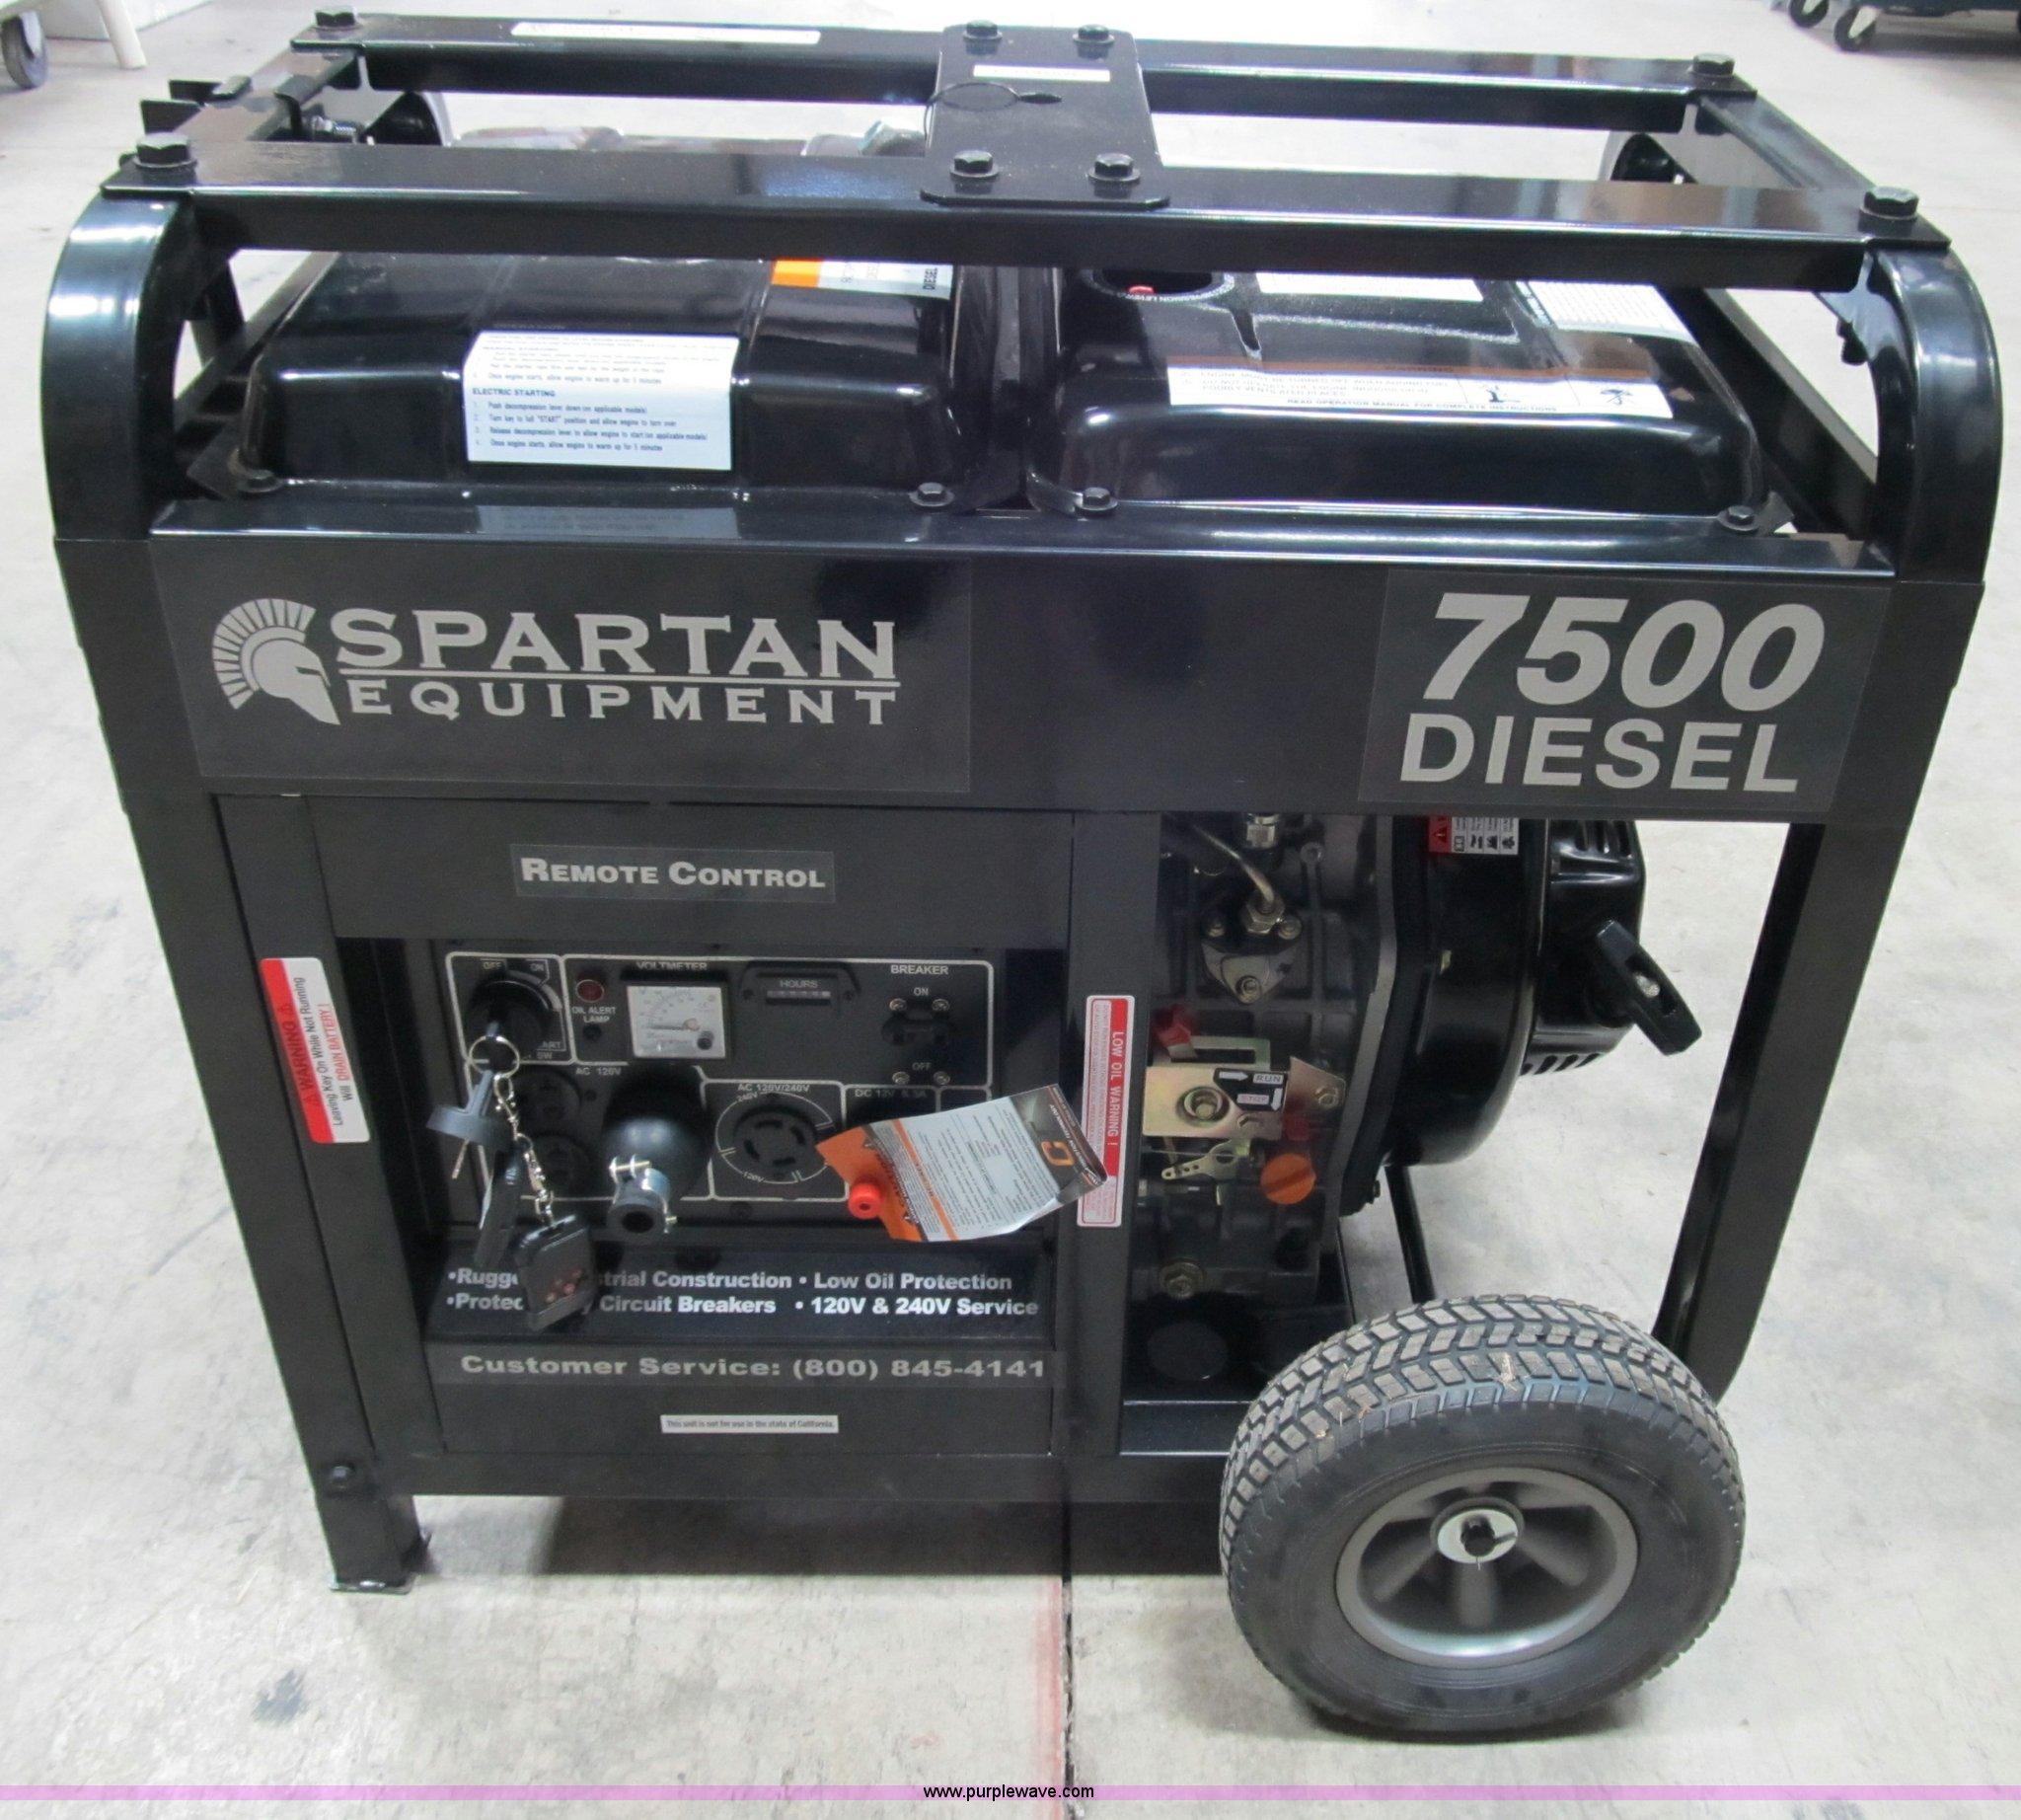 Spartan 7500D industrial generator Item D9259